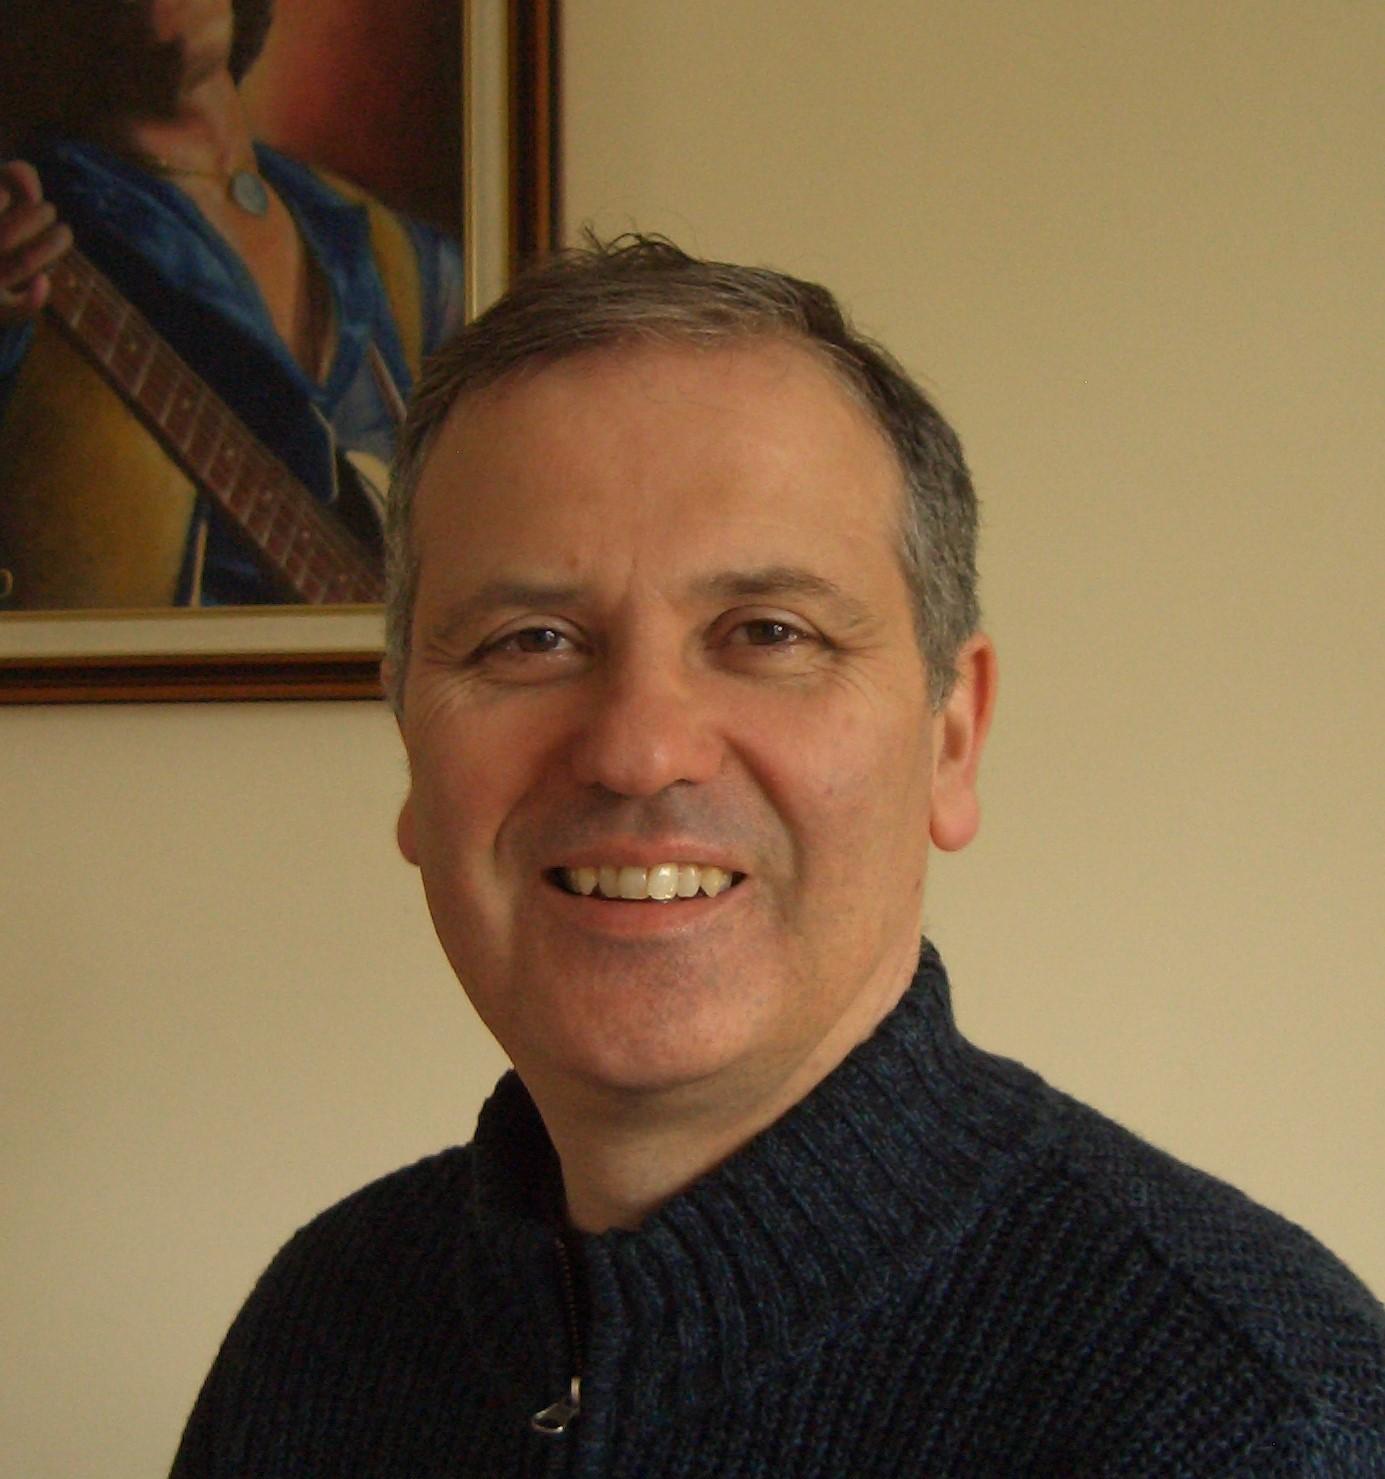 Rick Hardcastle